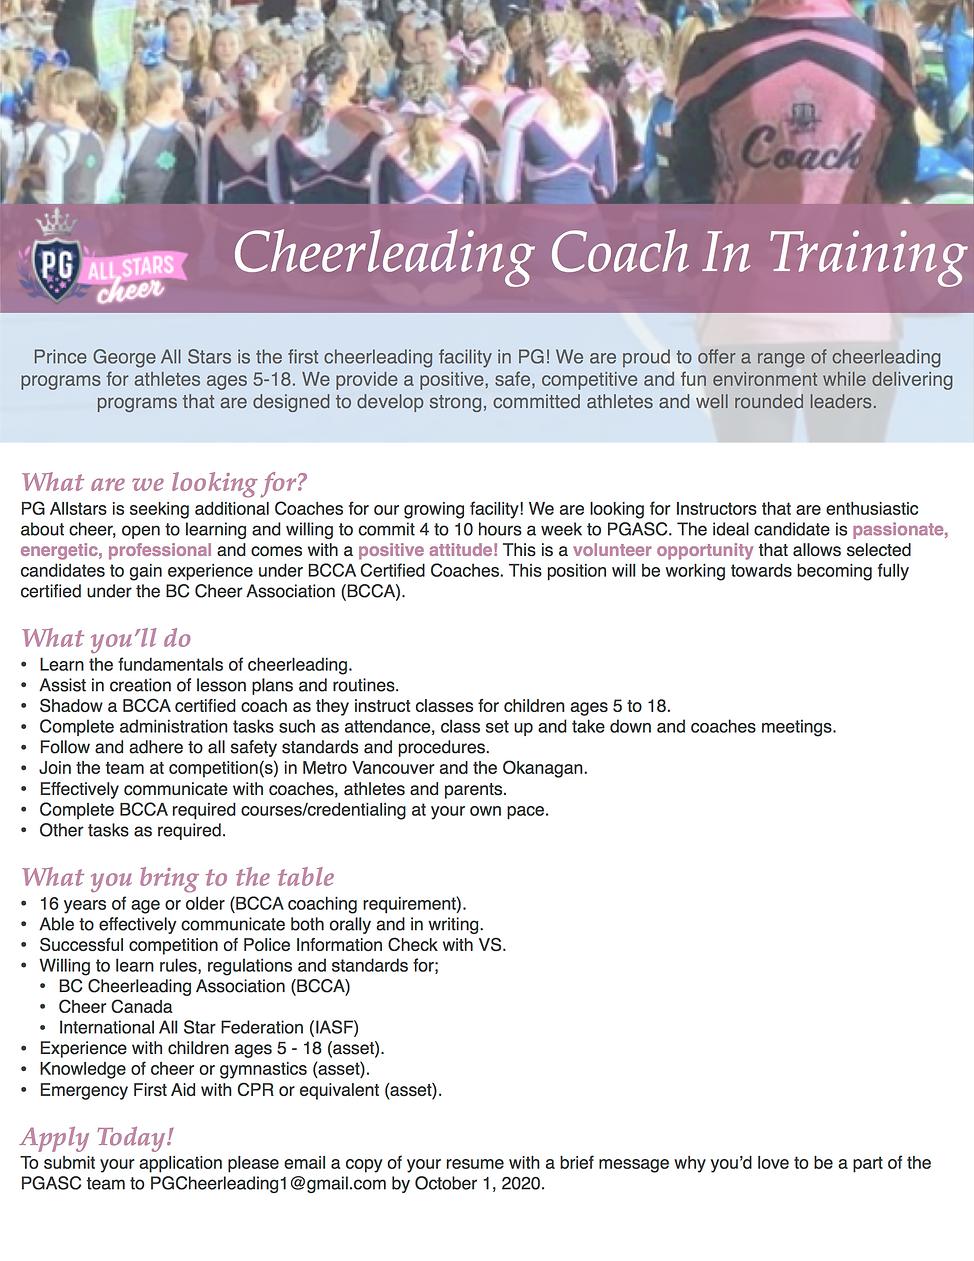 202007 - PGA - Job Posting - Coach In Tr